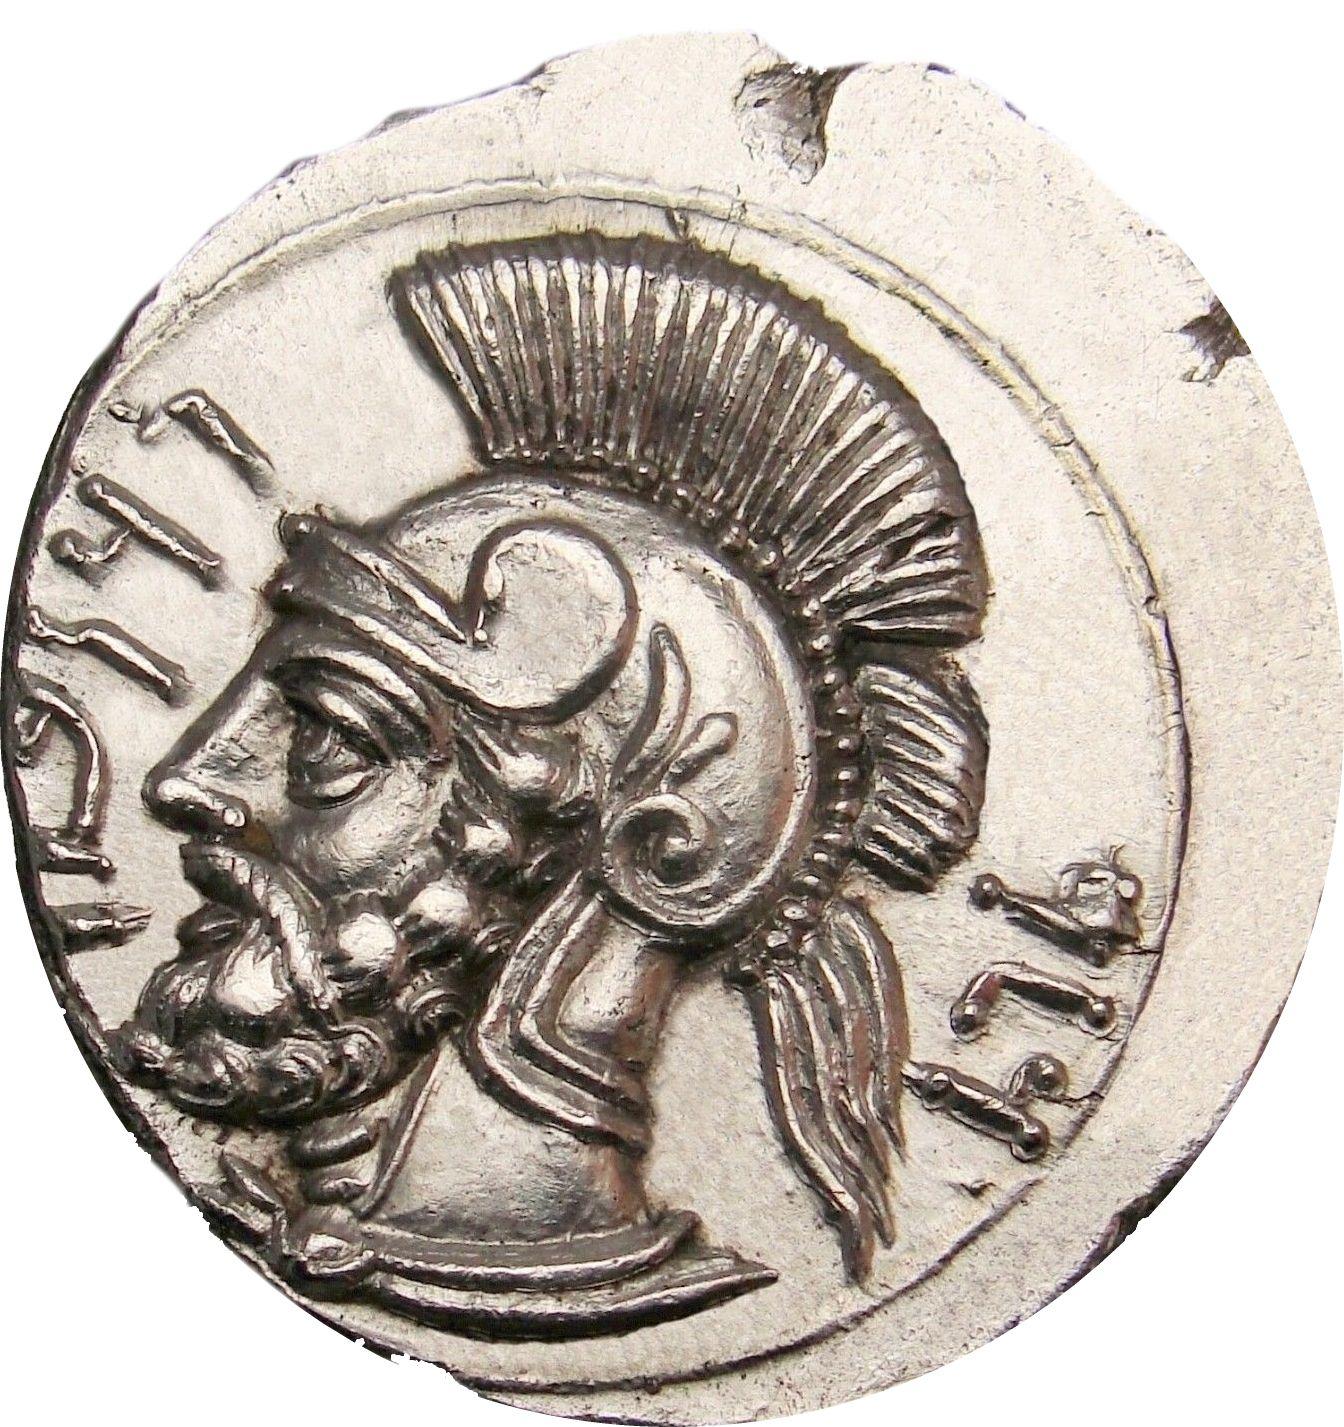 VENI VIDI VICI Men's TShirt Julius Caesar Coin art